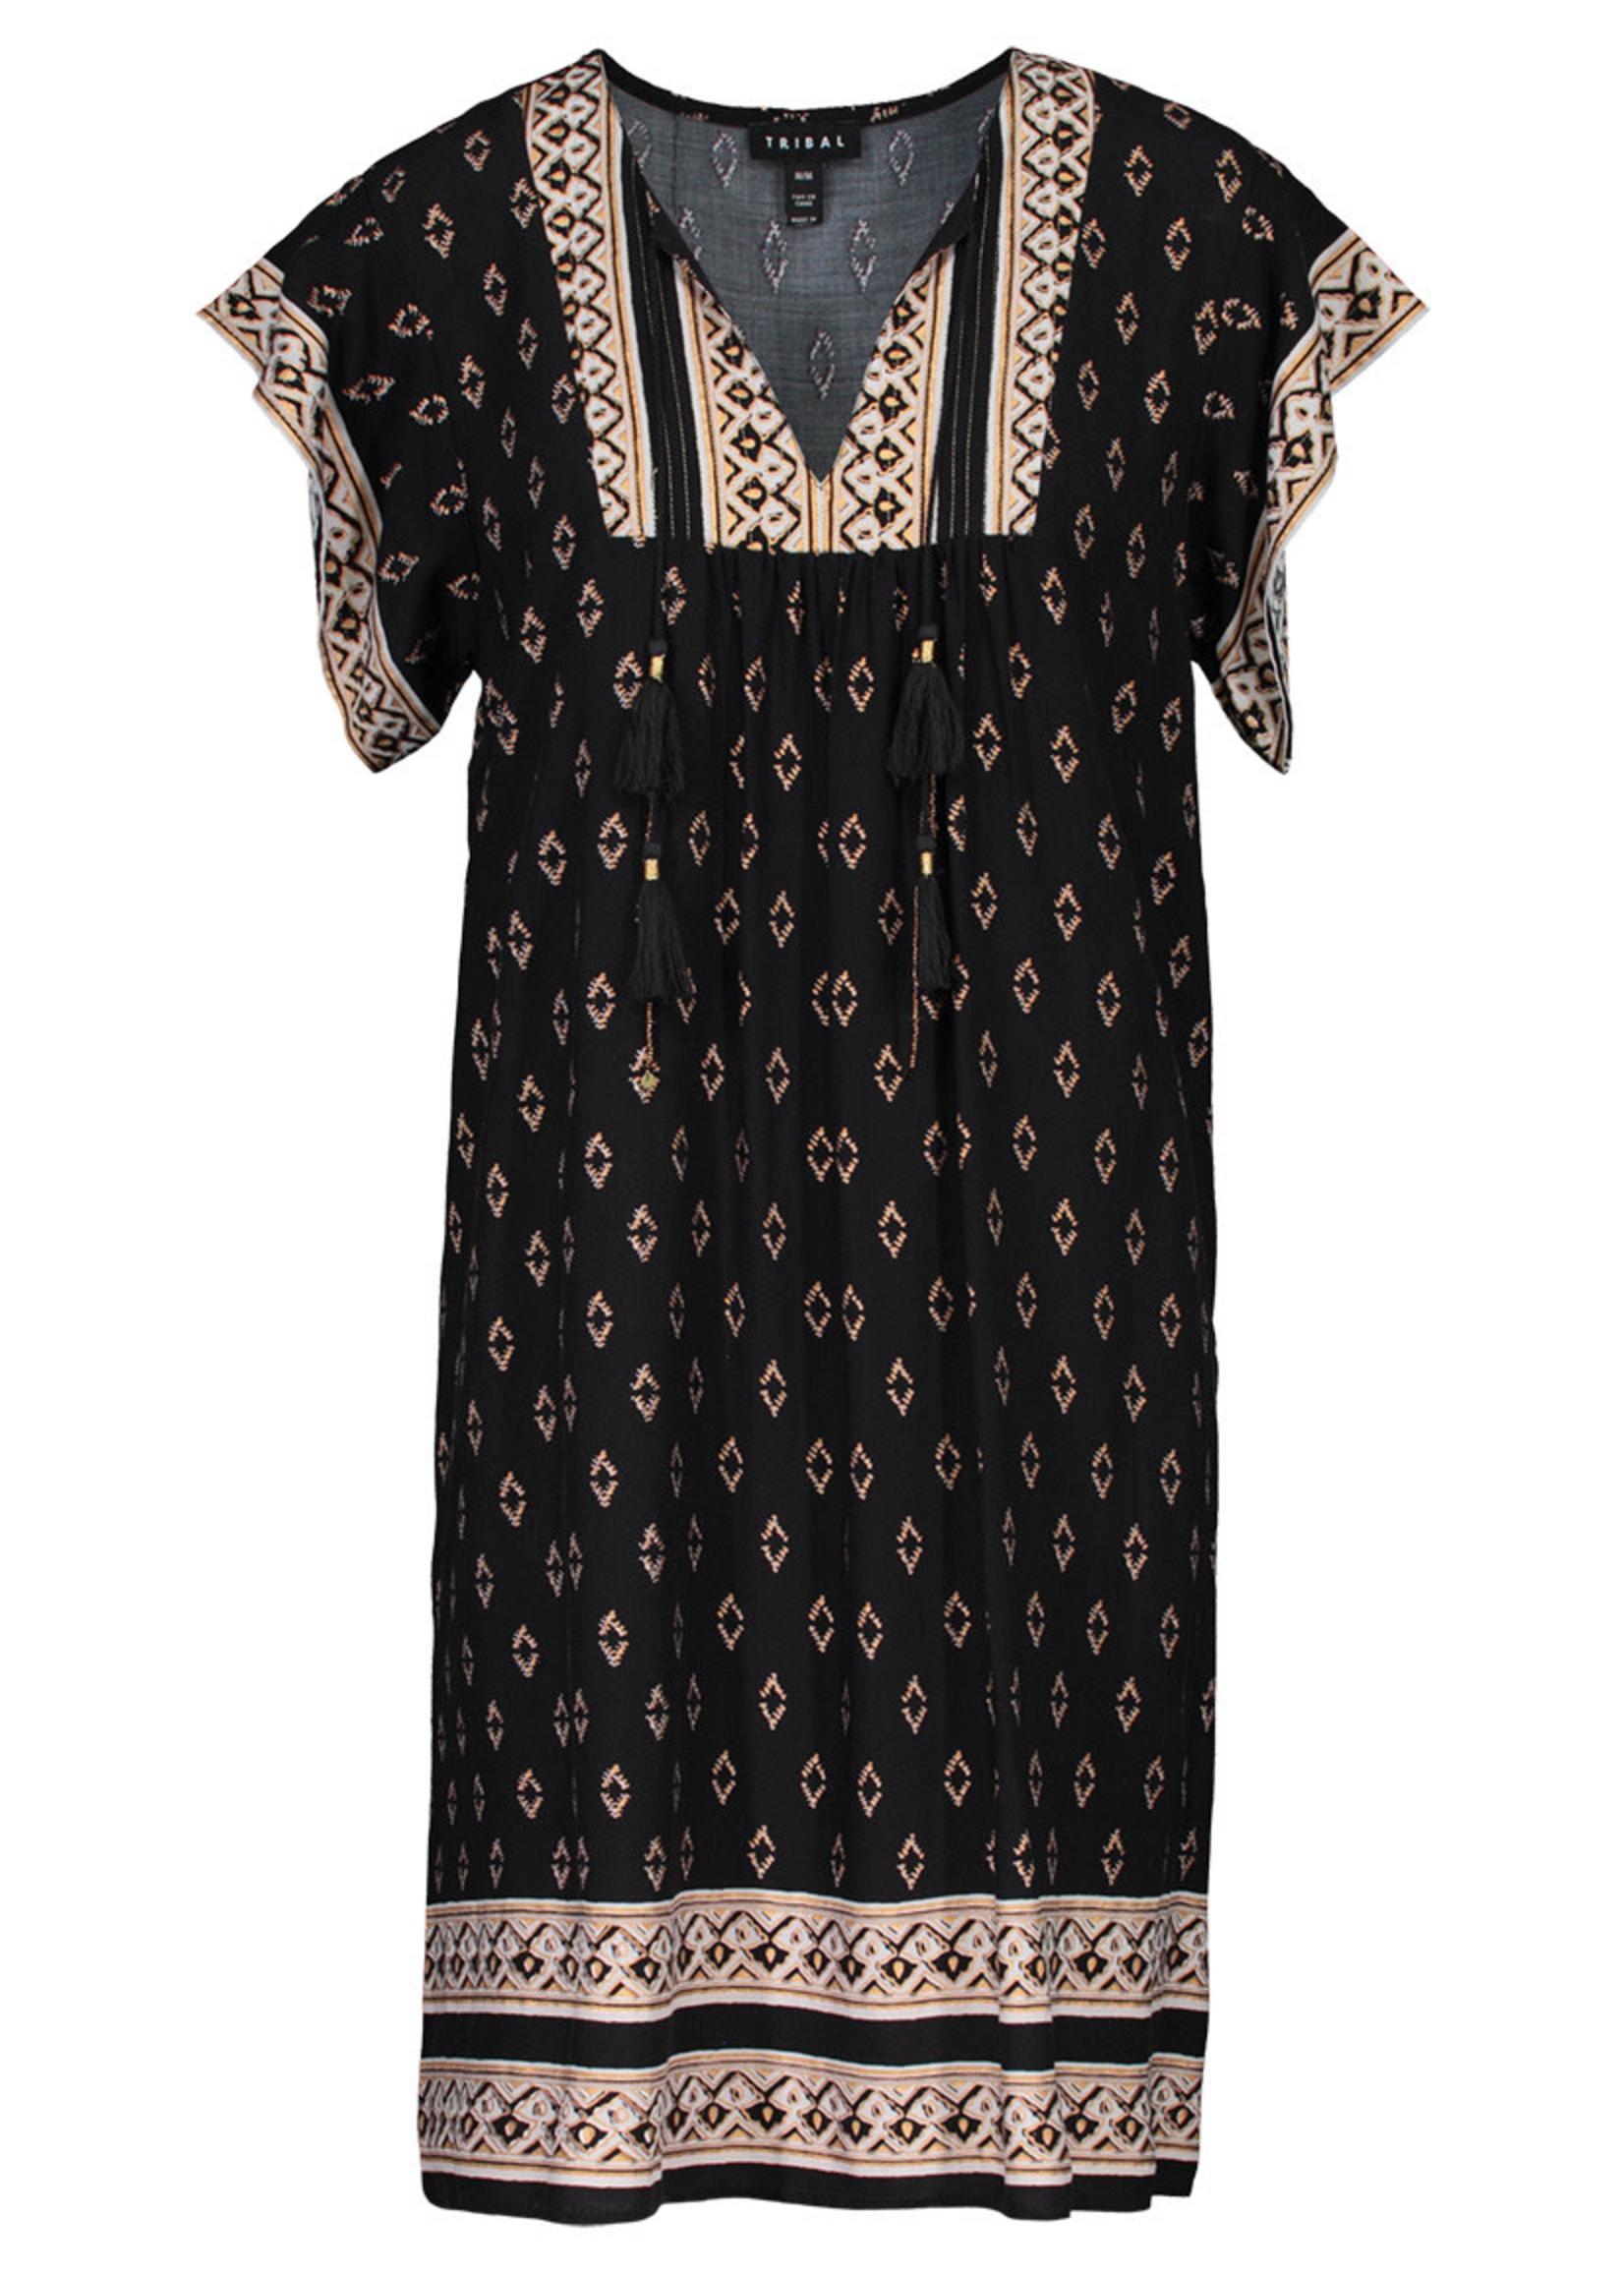 Tribal Short Sleeve Dress with Tassels 45370/3277